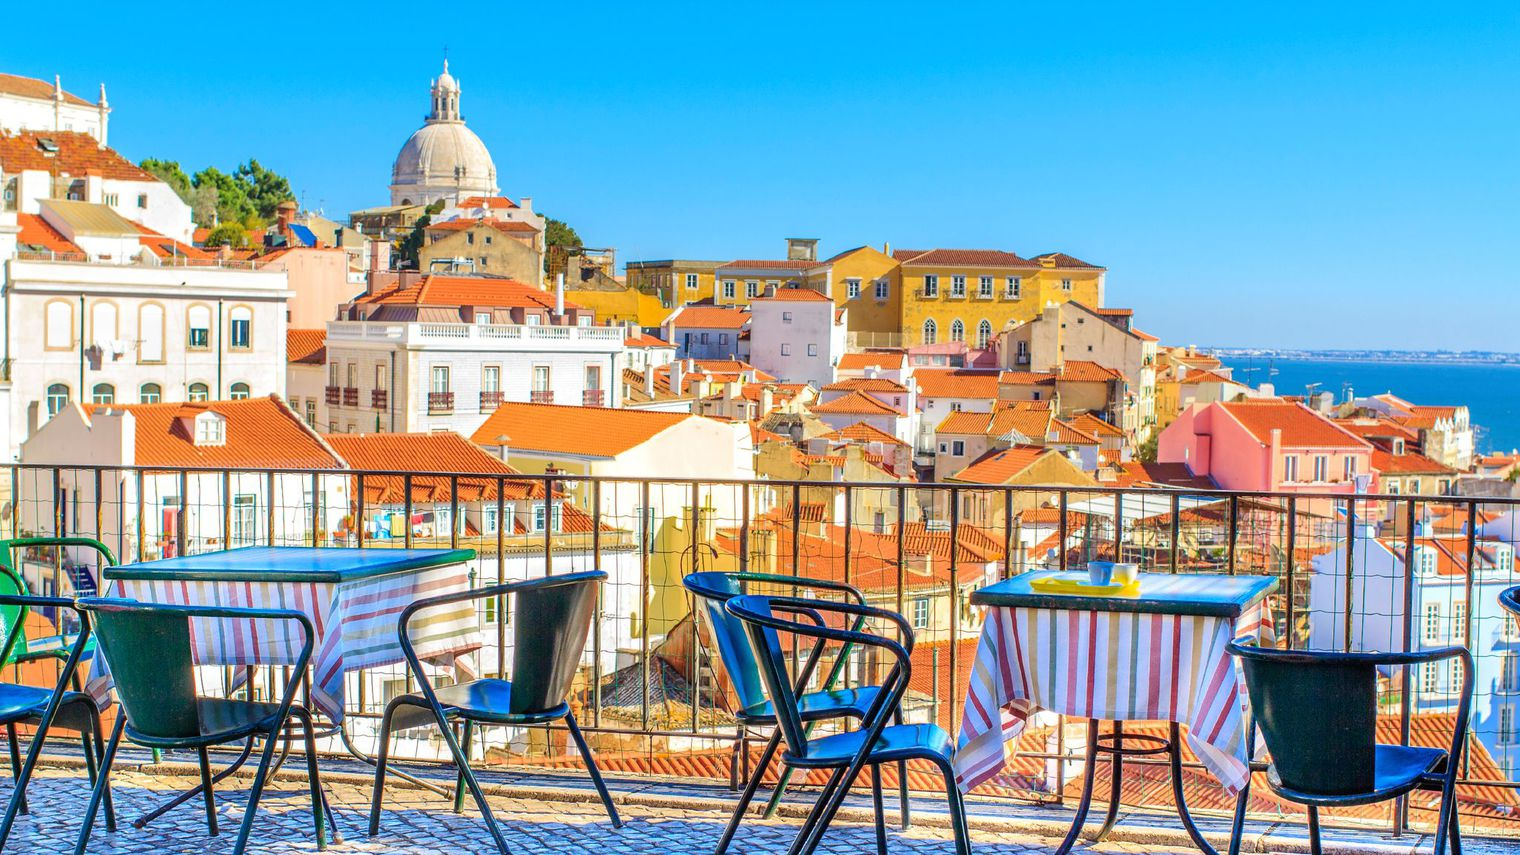 lisbonne-portugal-1_5383037